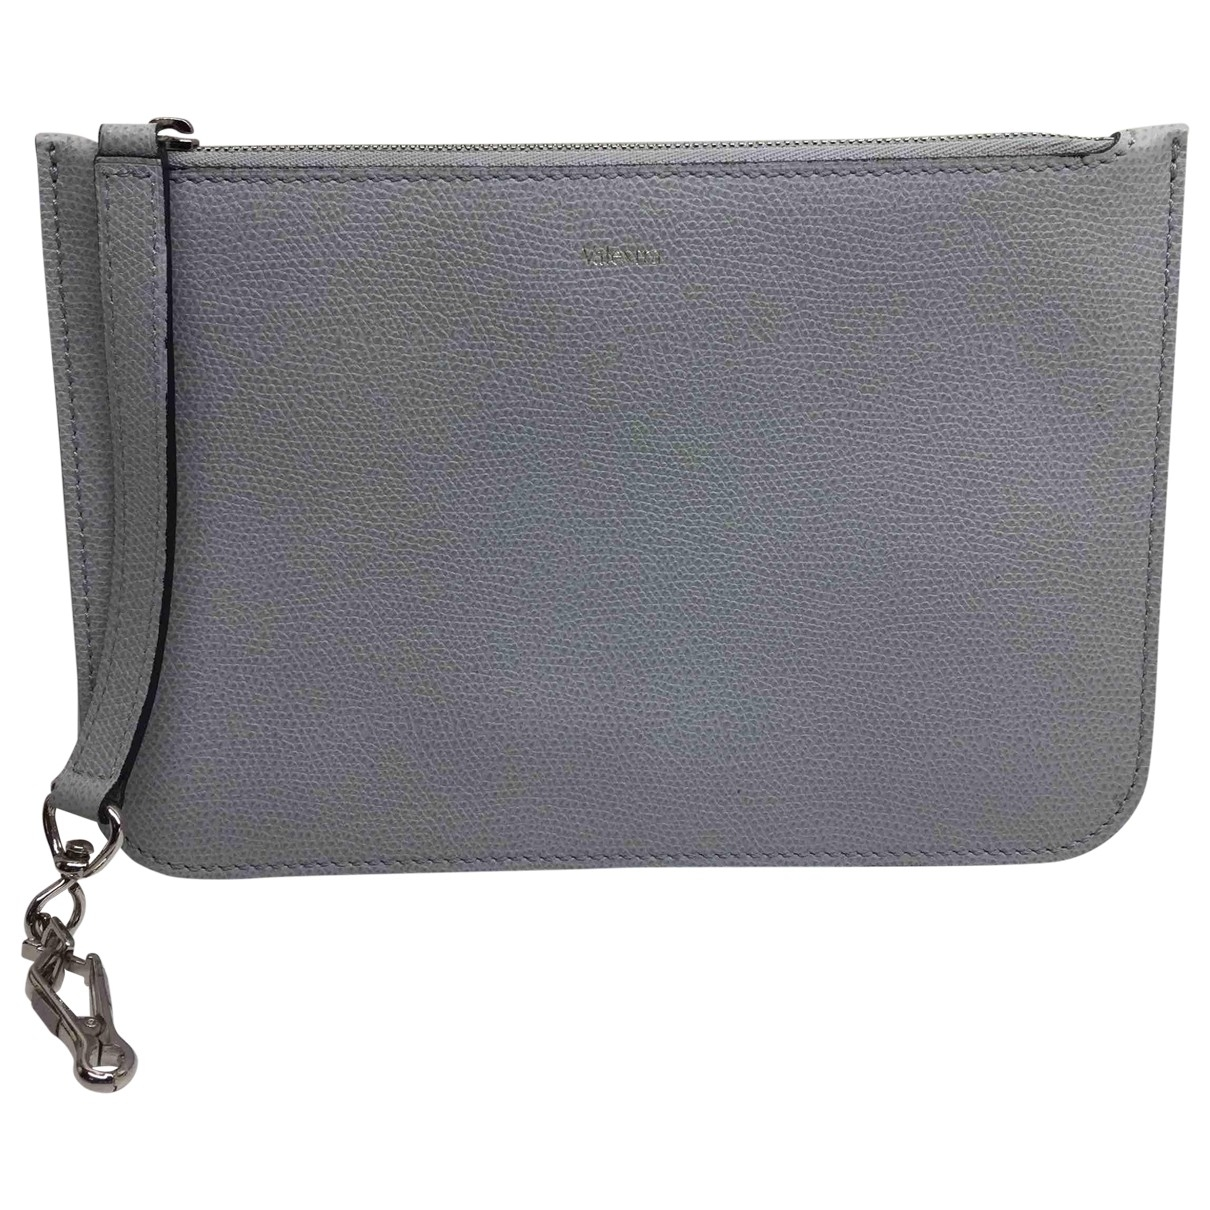 Valextra \N Grey Leather Clutch bag for Women \N